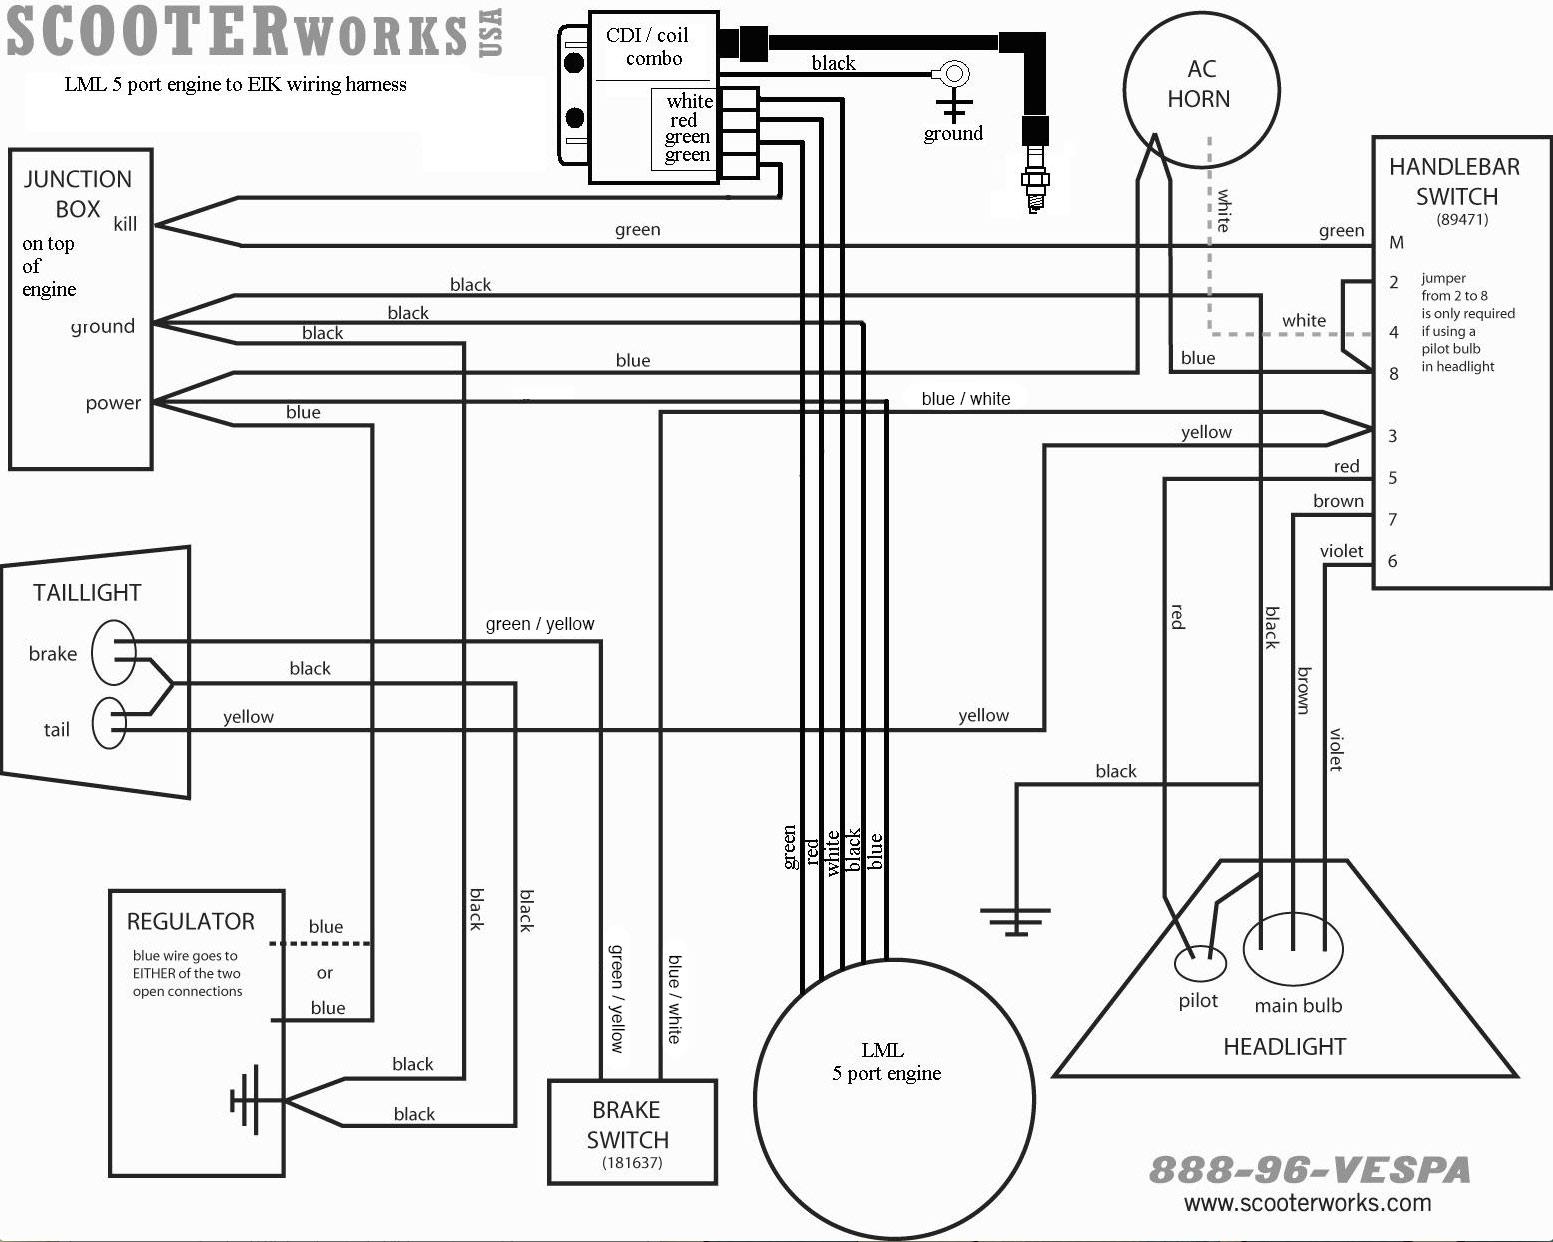 taotao 50cc scooter wiring diagram headlight taotao wiring  LML_5_port_engine_to_EIK_harness?resize\=665%2C532\&ssl\=1 taotao 50cc  scooter